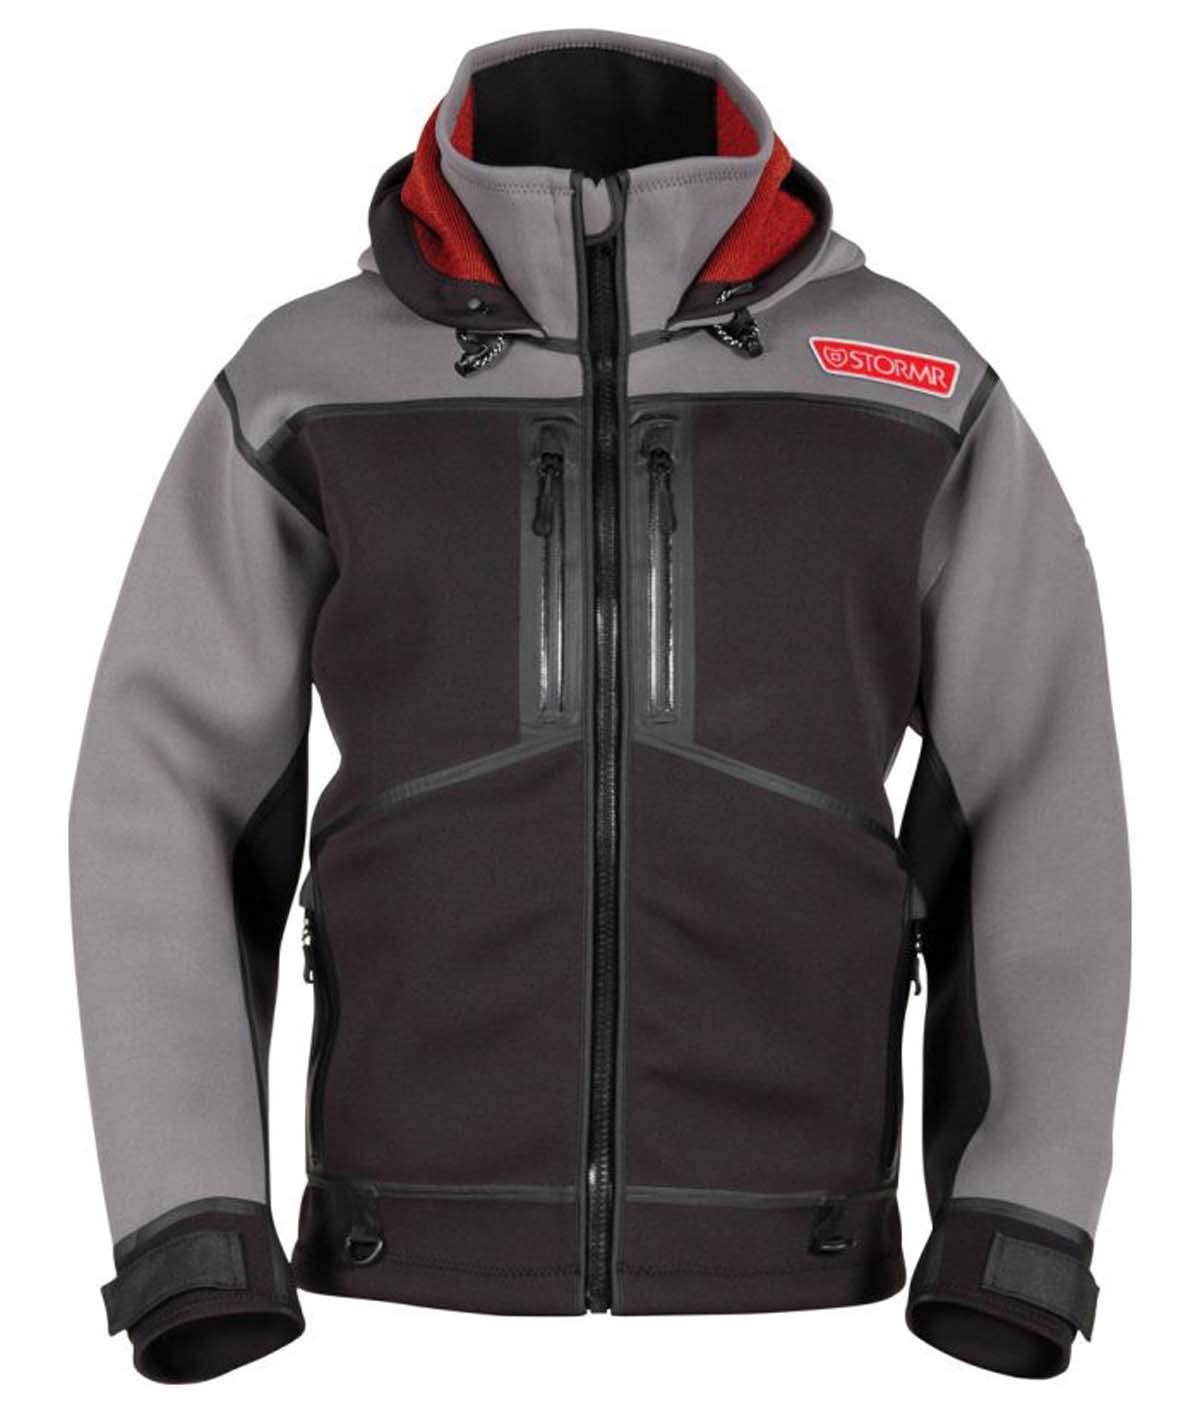 STORMR Strykr Neoprene Jacket, Gray, Small